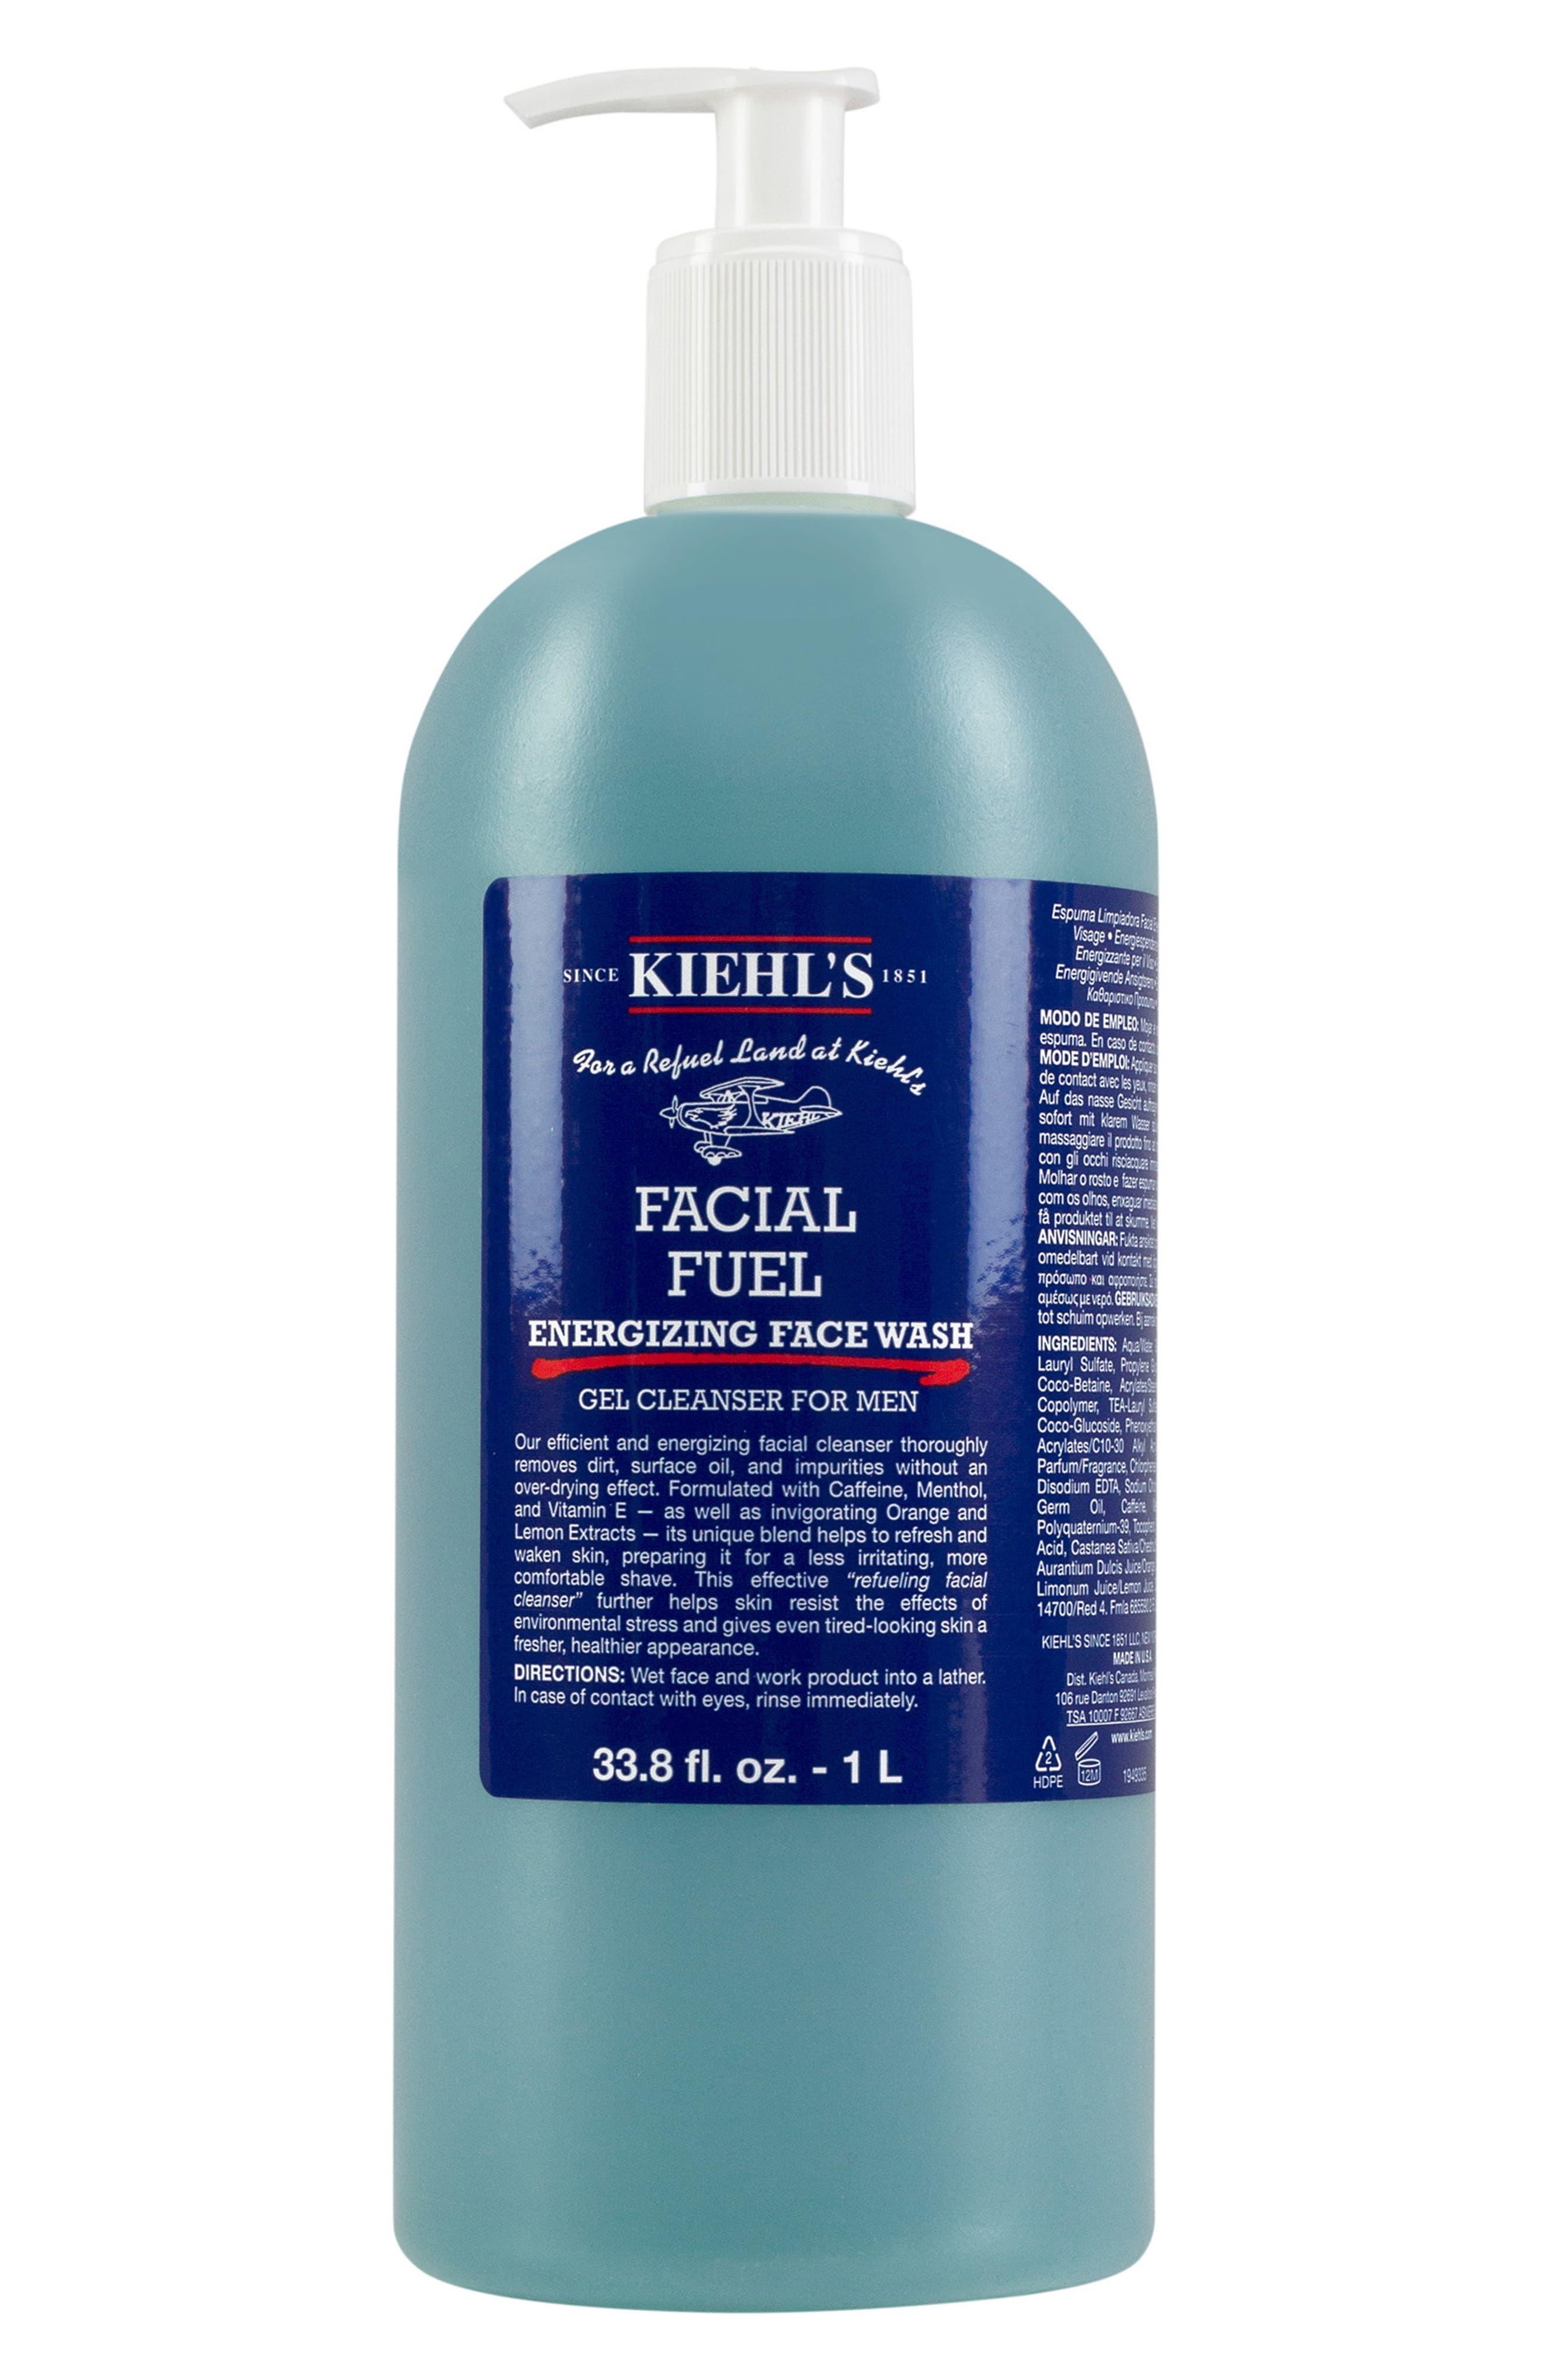 KIEHL'S SINCE 1851,                             Jumbo Facial Fuel Energizing Face Wash,                             Main thumbnail 1, color,                             NO COLOR